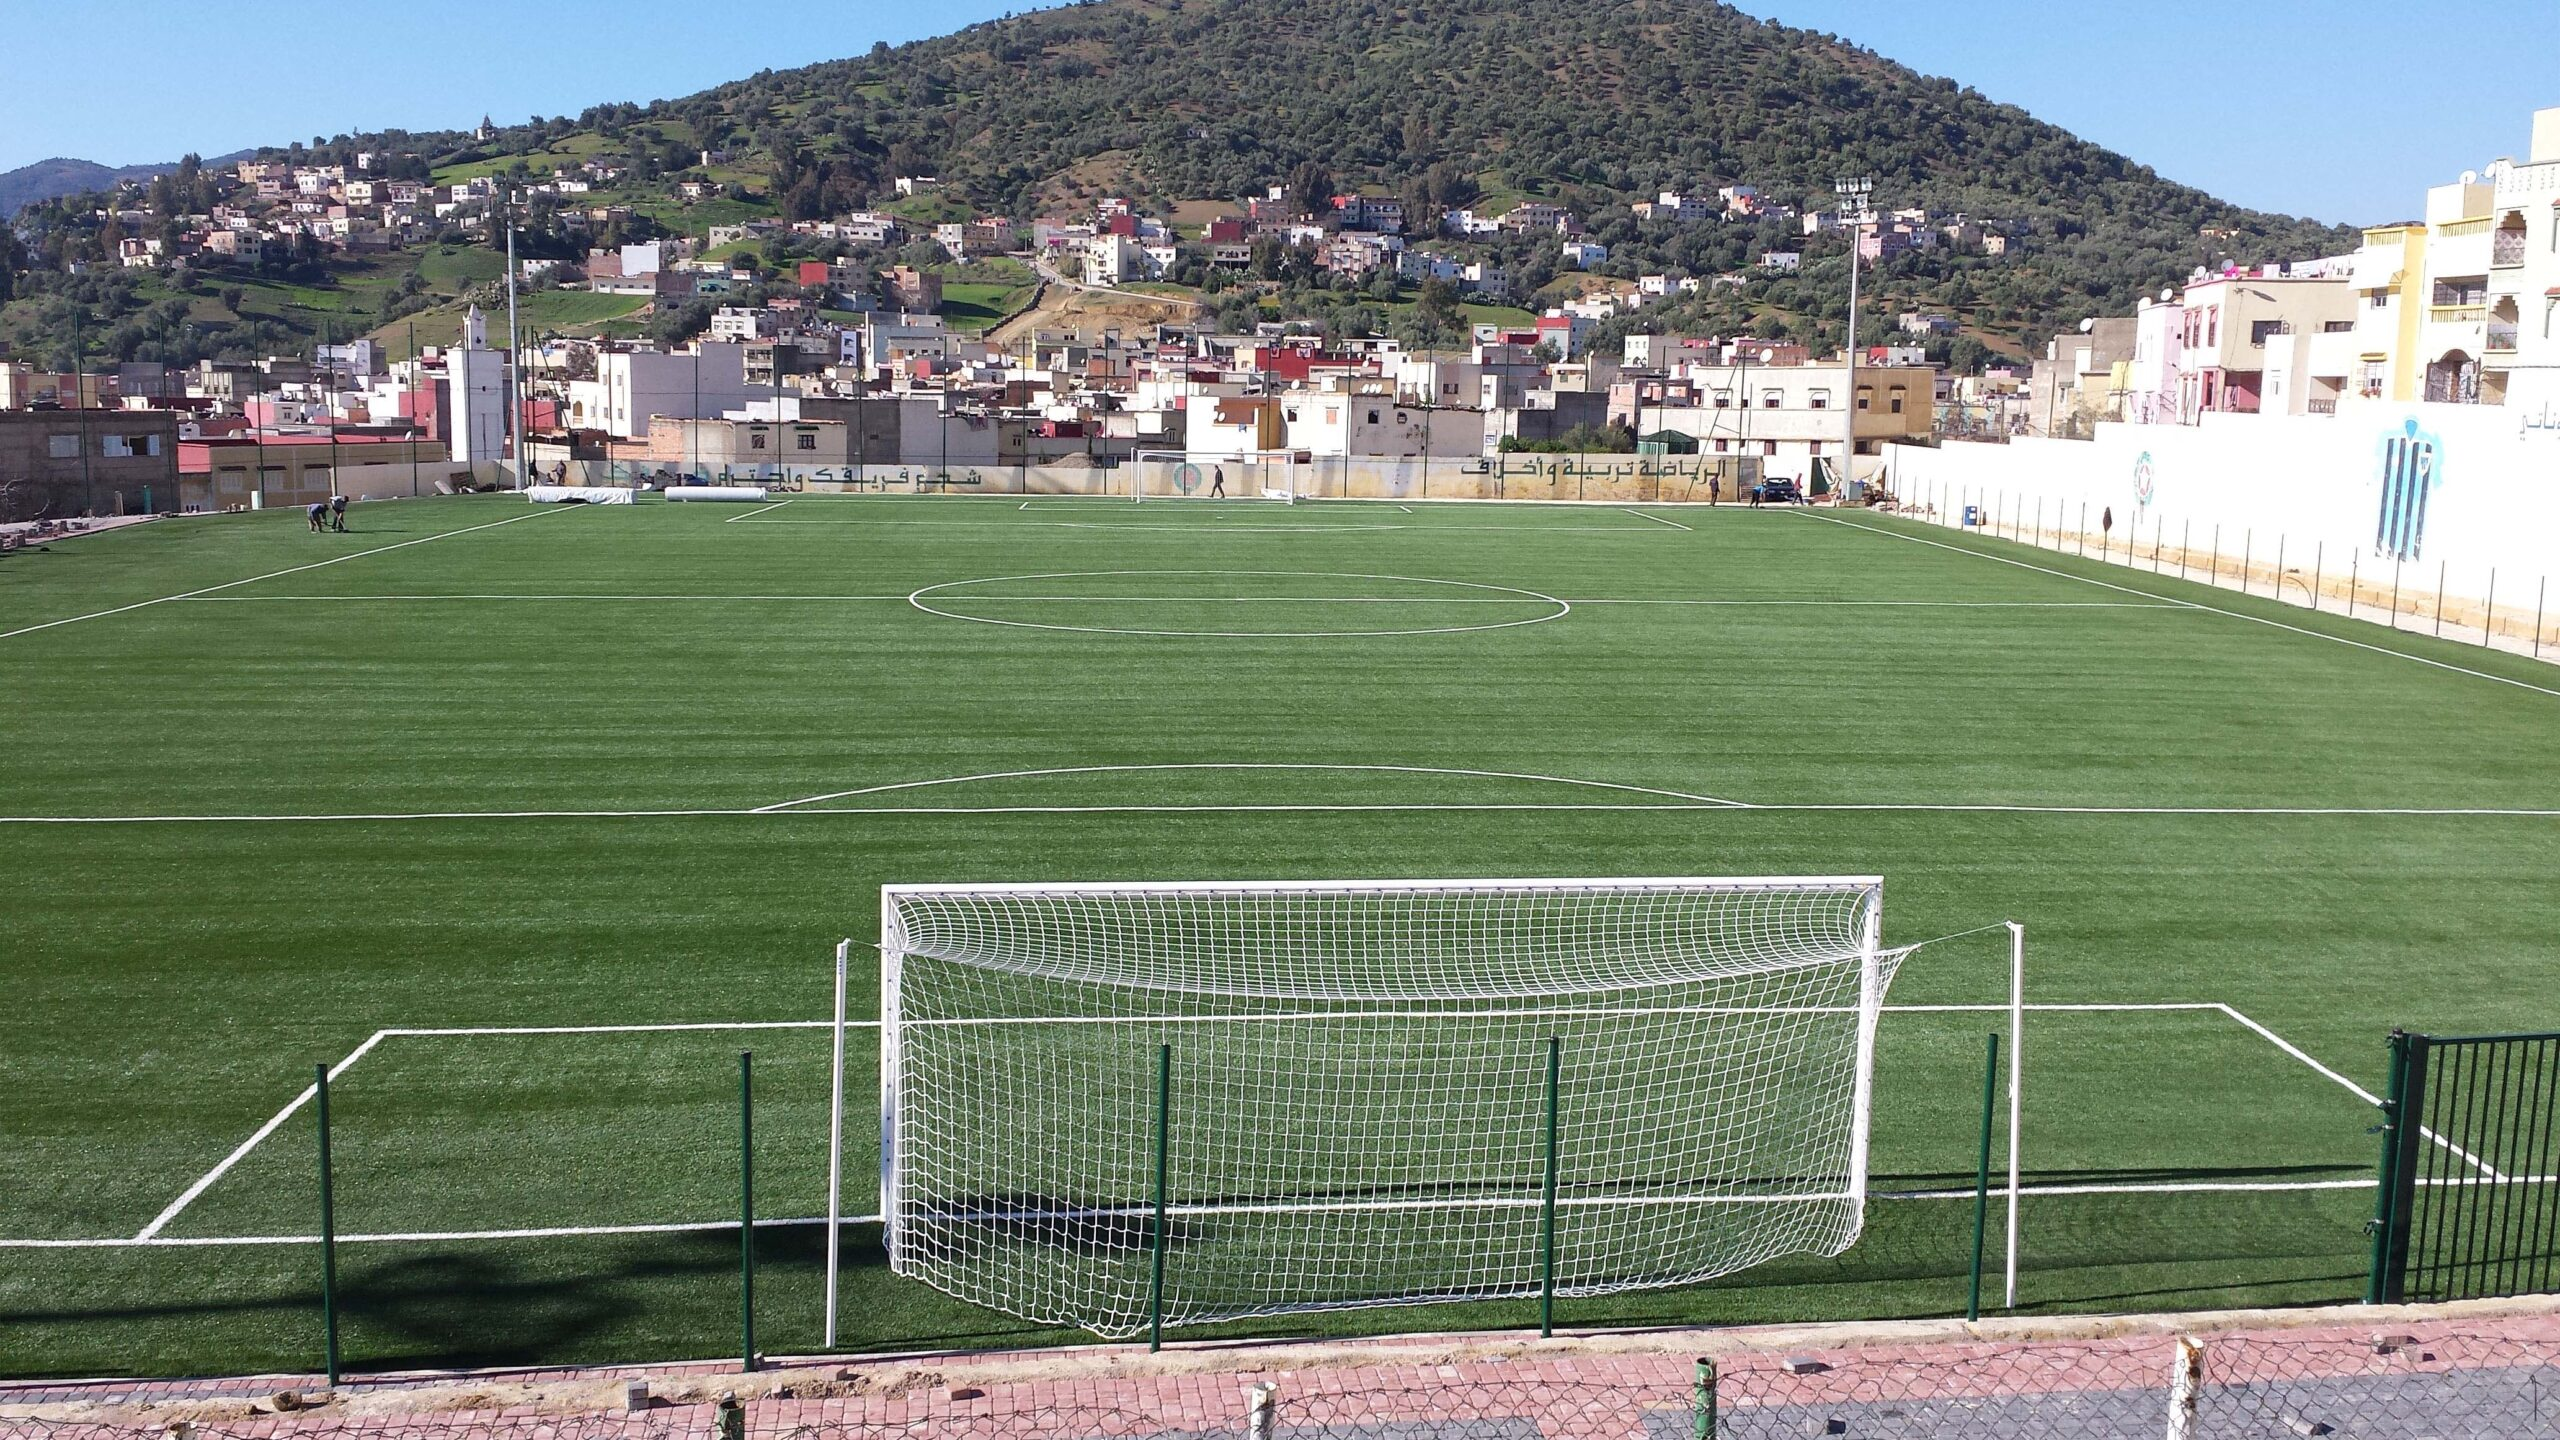 Campo de juego 16 Novembre (USTA) de Taounate.